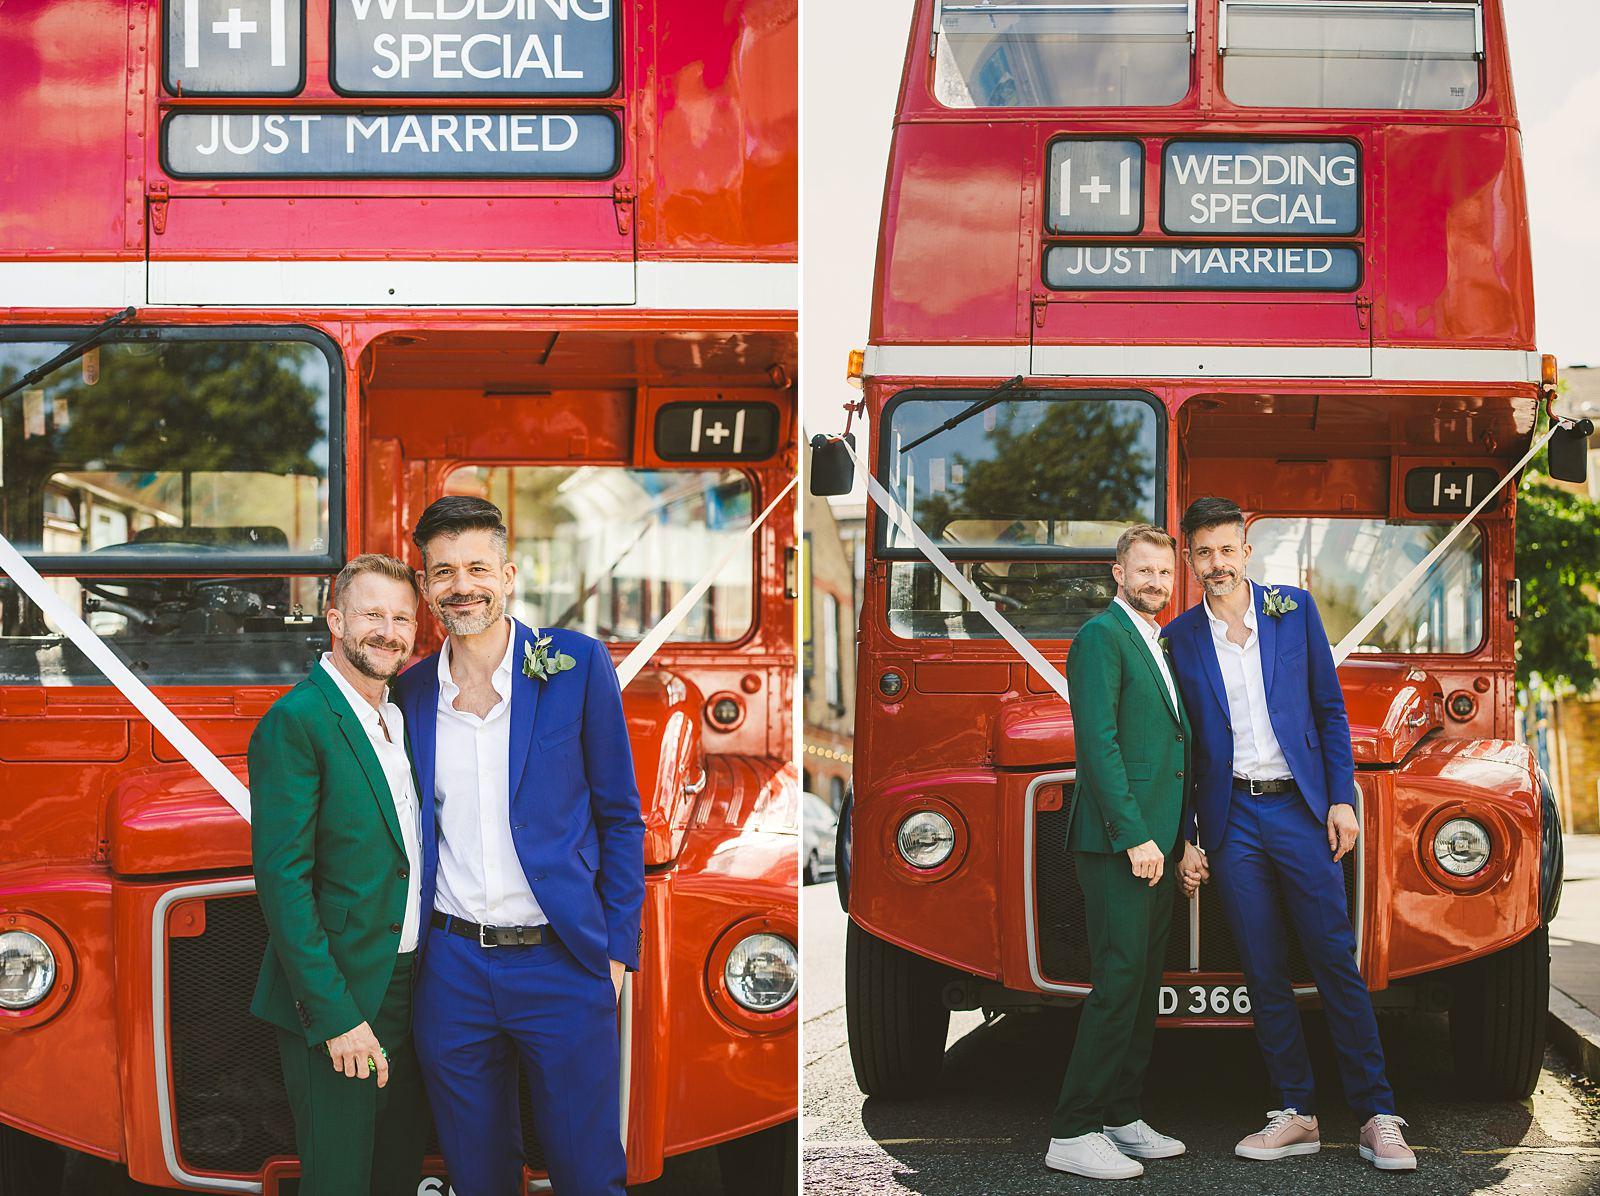 Grooms wedding-portrait London